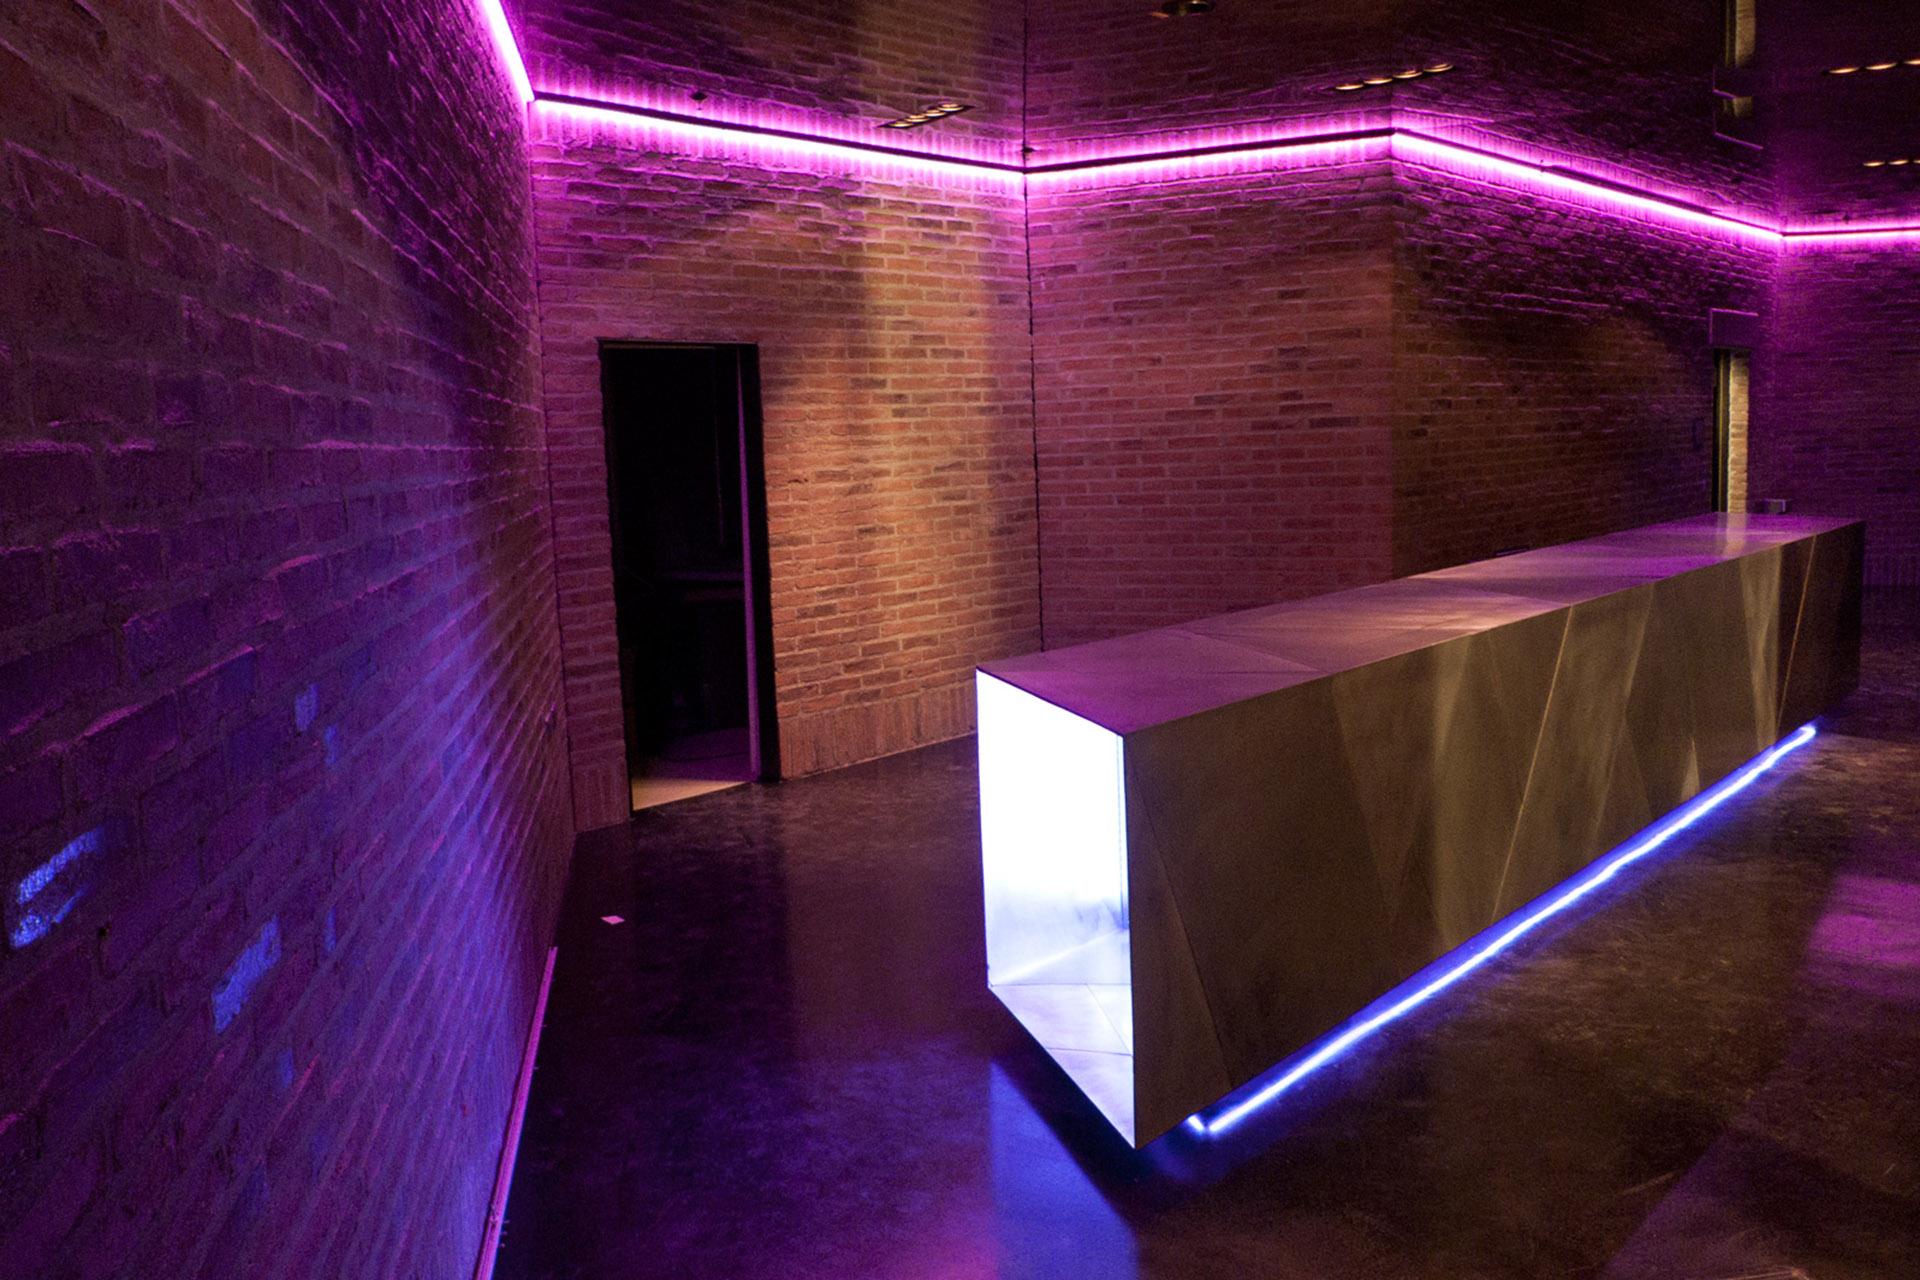 001-interior-design-hospitality-night-club-bar-skybar-muenchen-buero-philipp-moeller.jpg